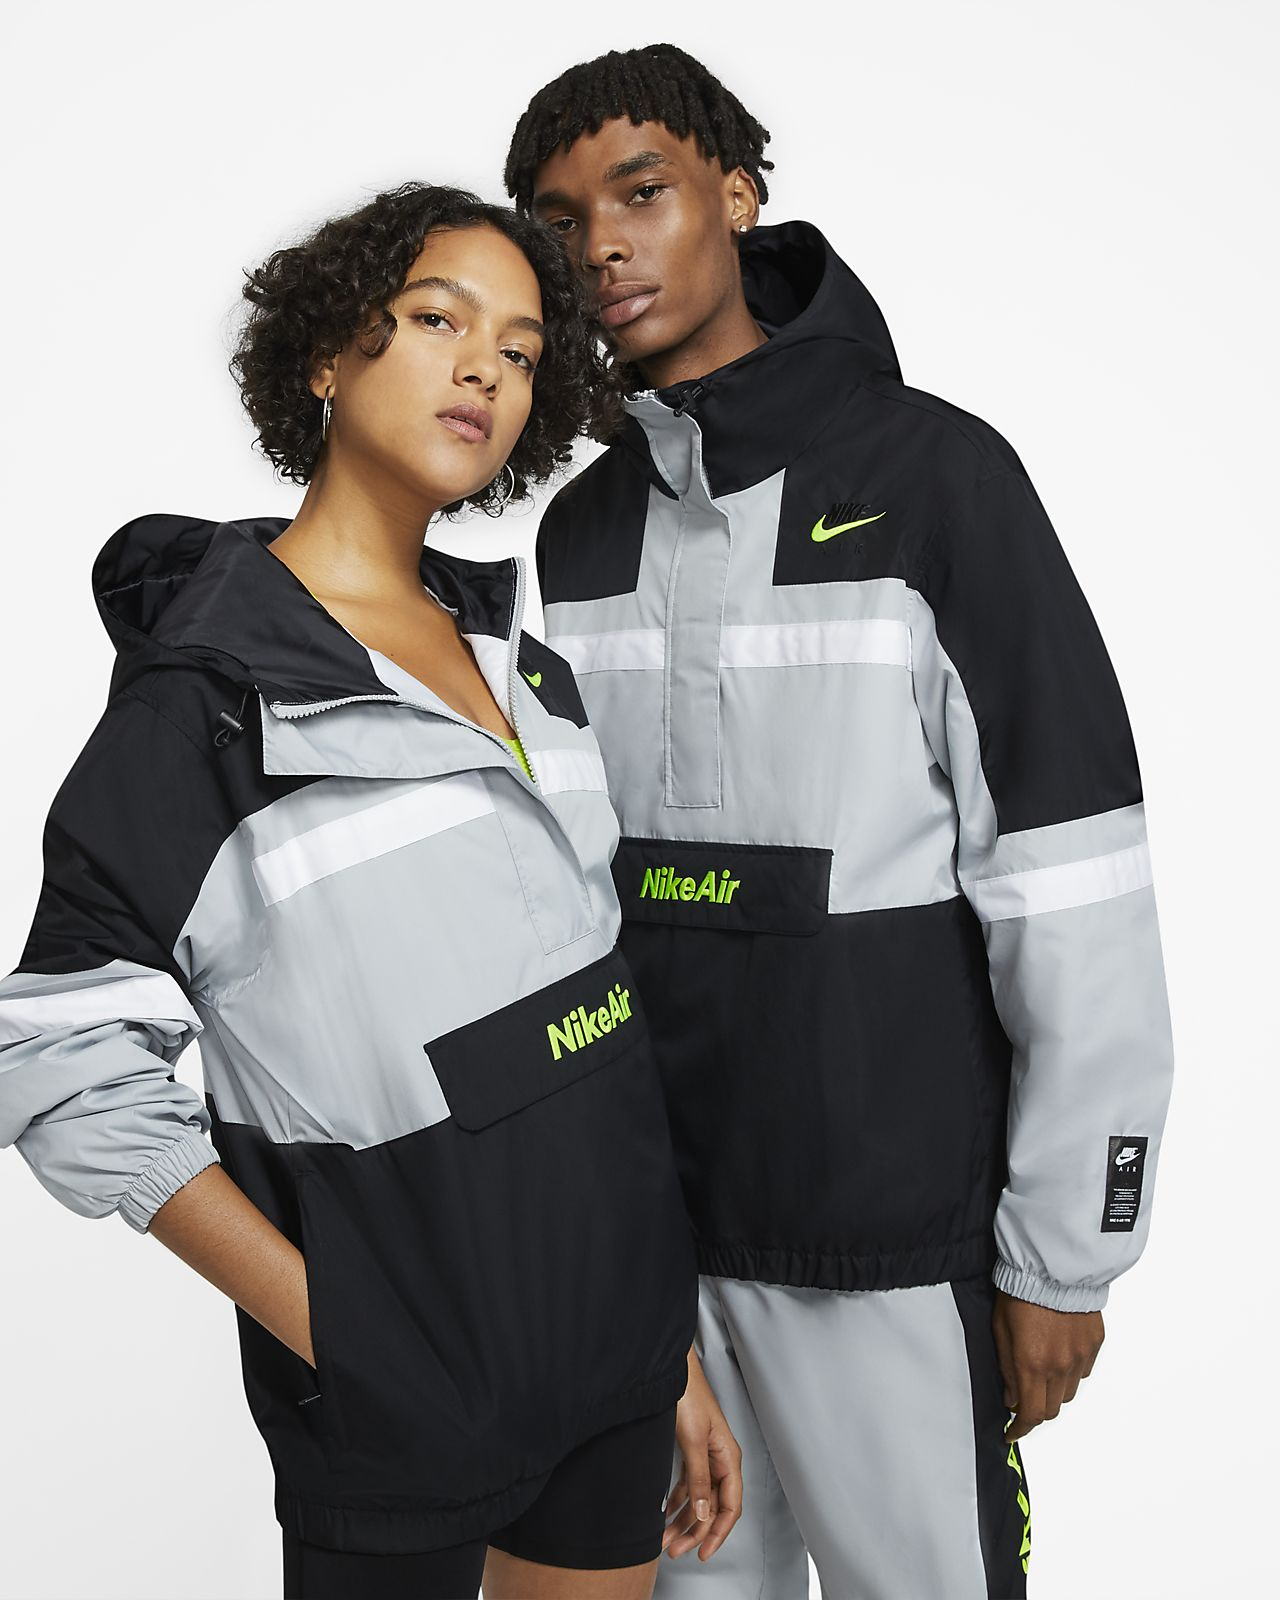 Nike Air Woven Jacket